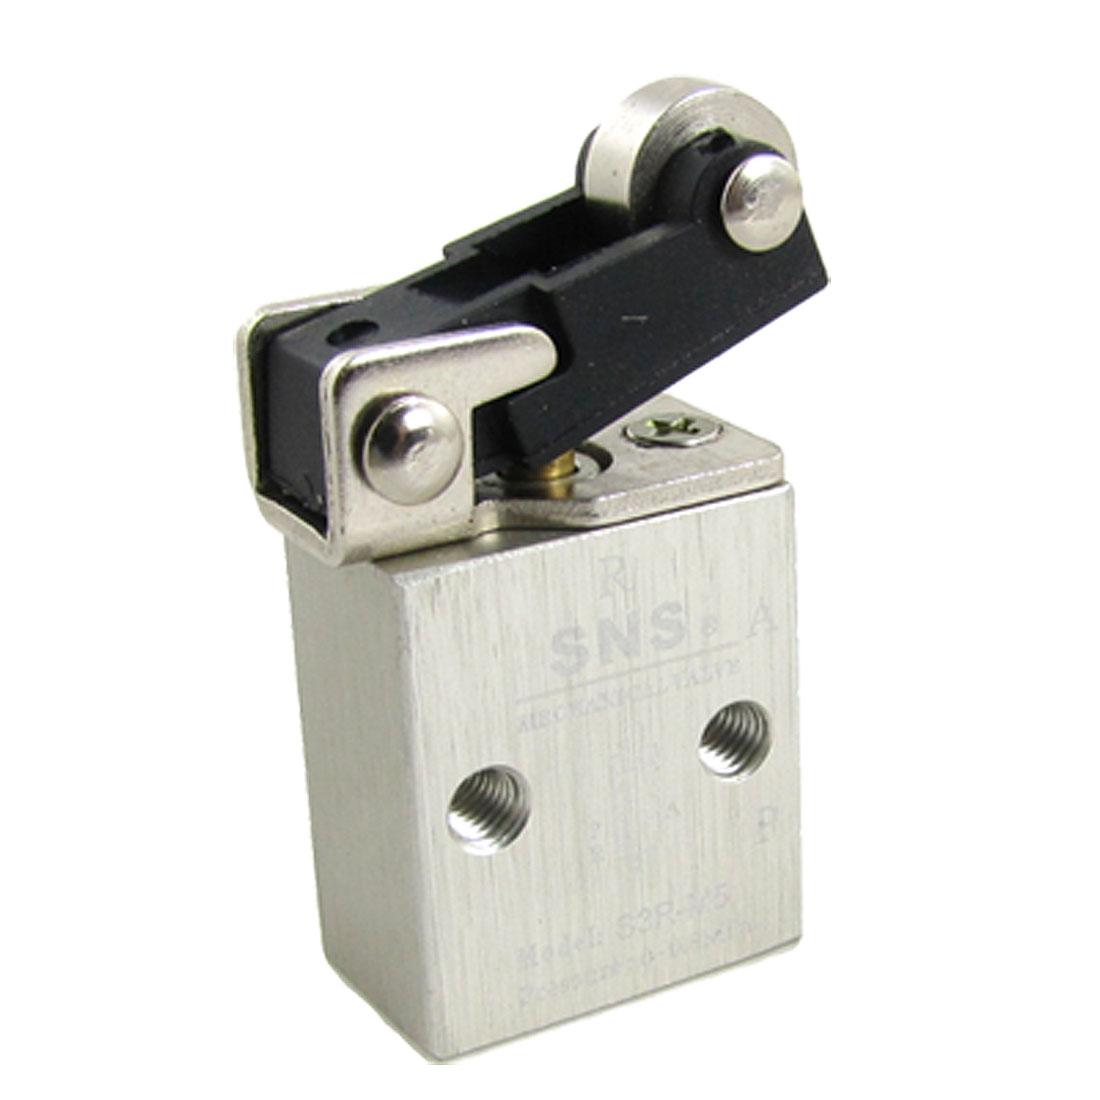 S3R-M5 2 Position 3 Way Pneumatic Component Mechanical Valve